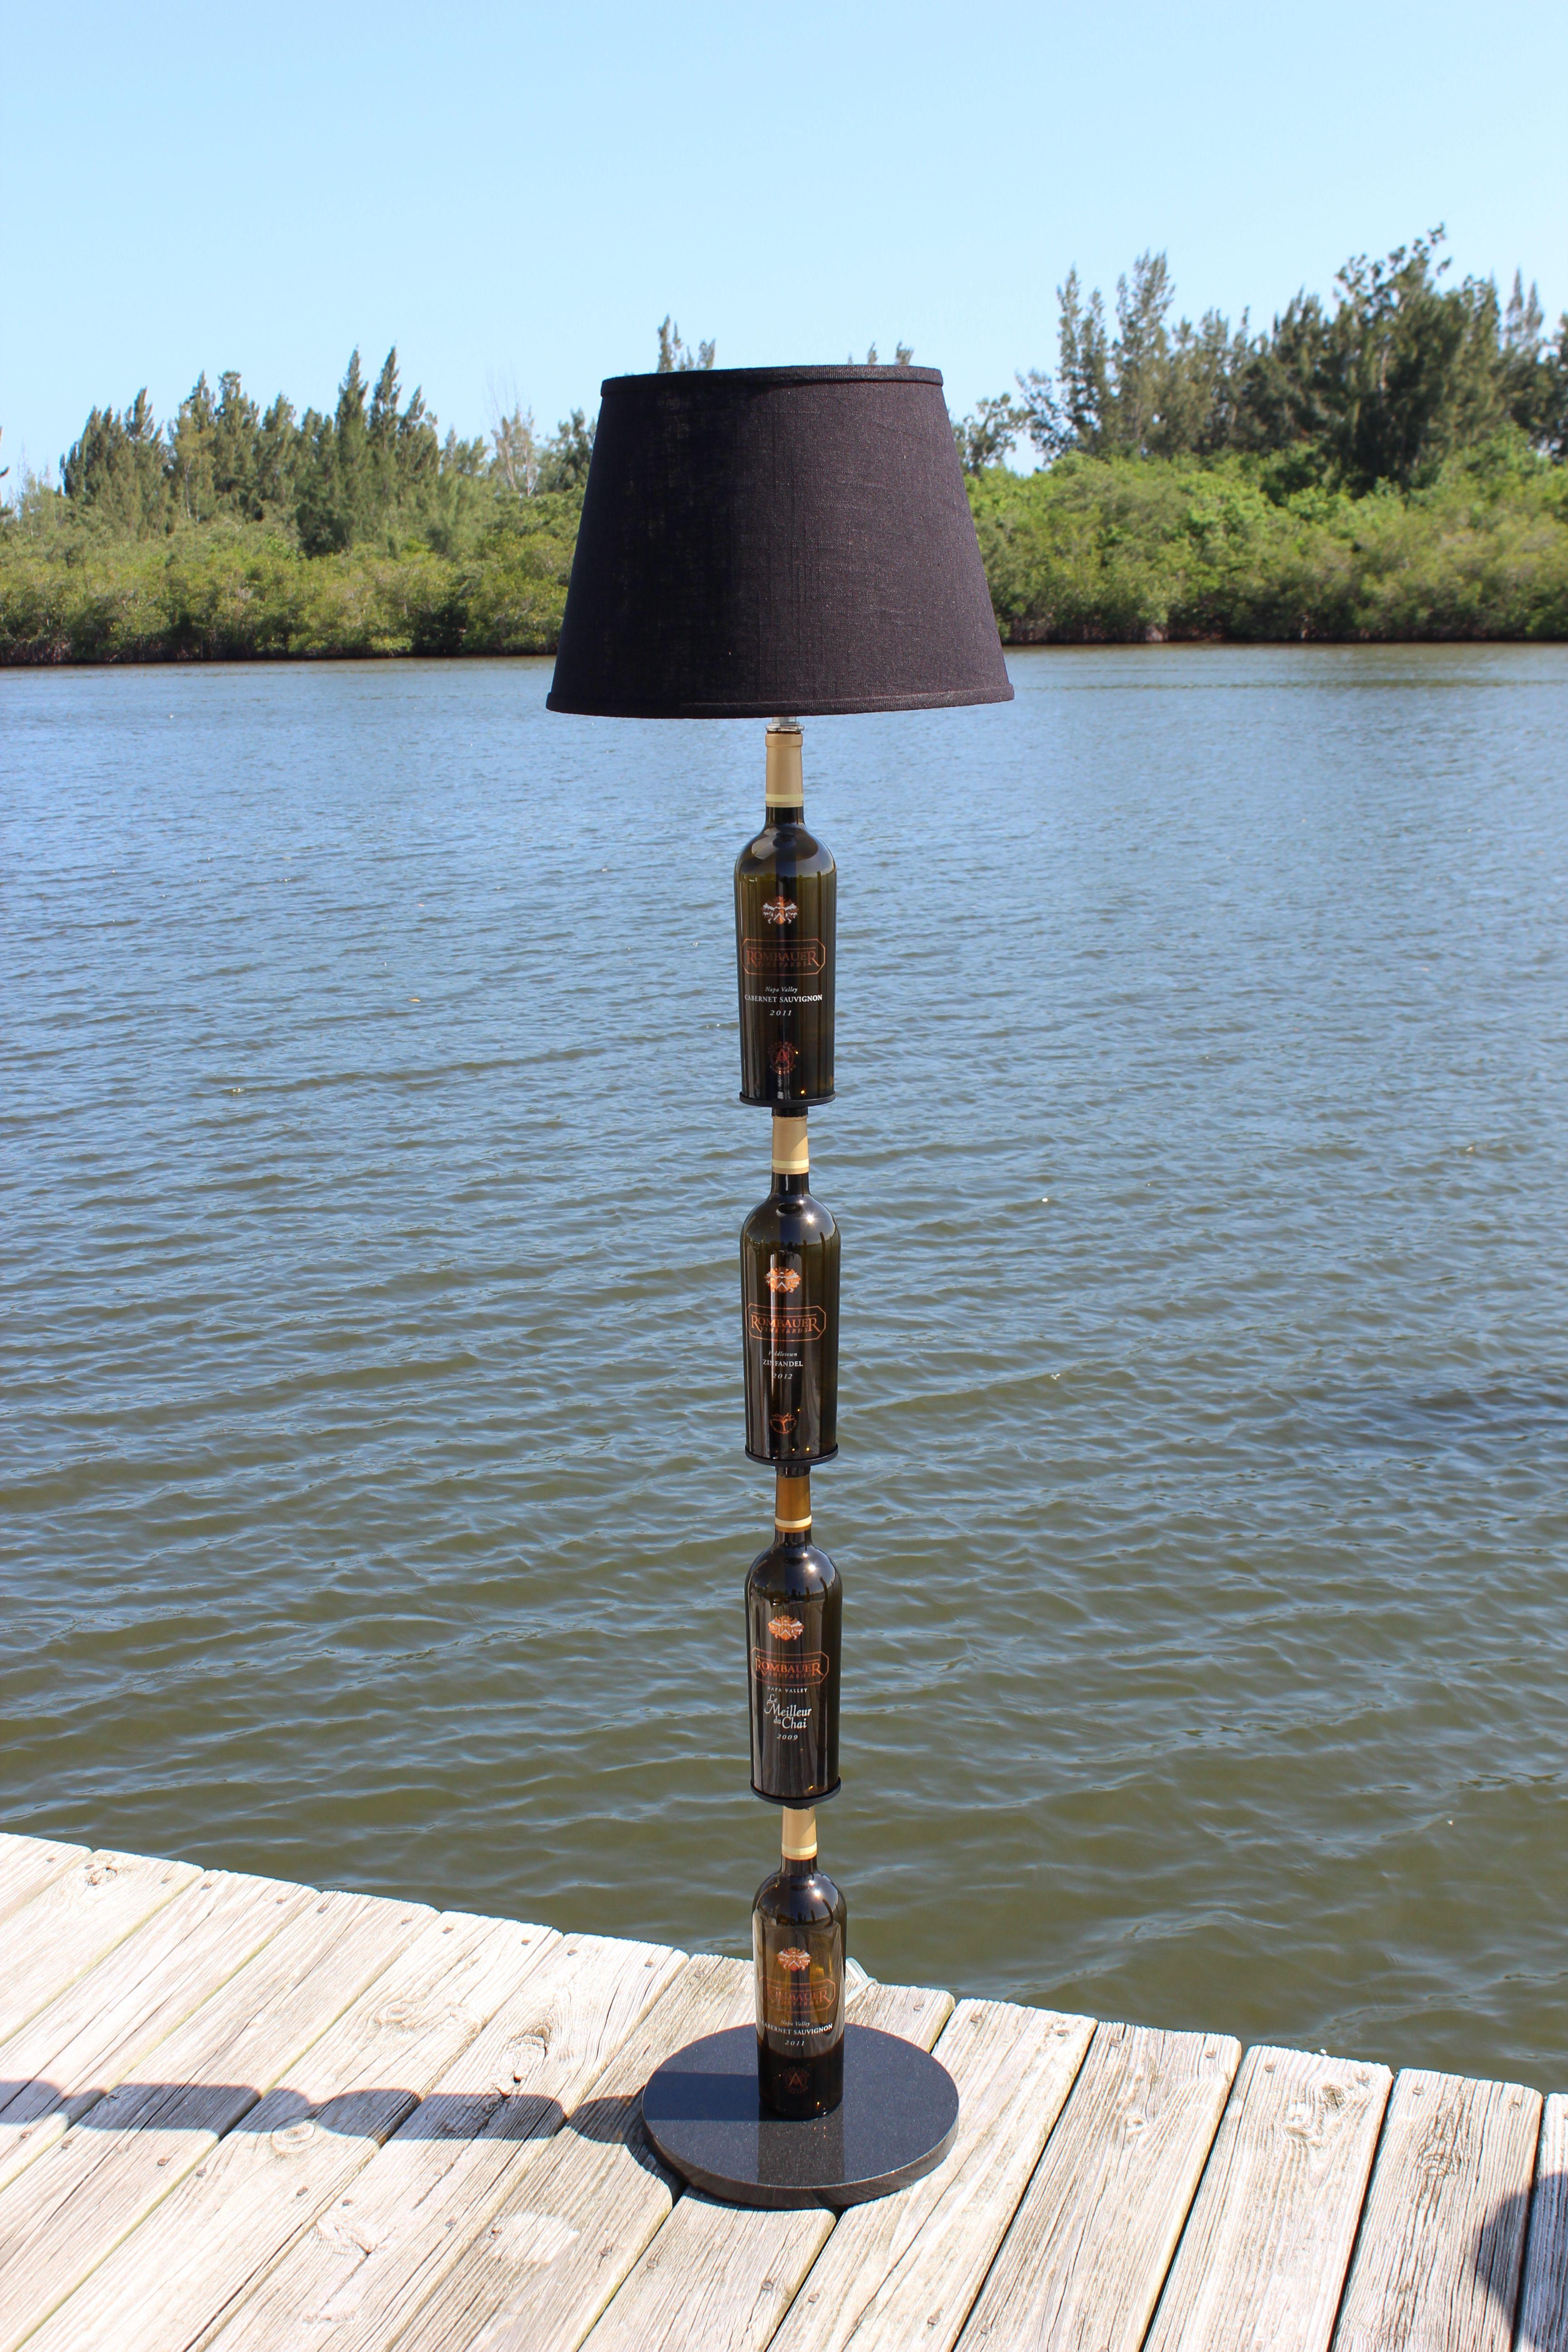 Buy A Custom Wine Bottle Floor Lamp Made To Order From